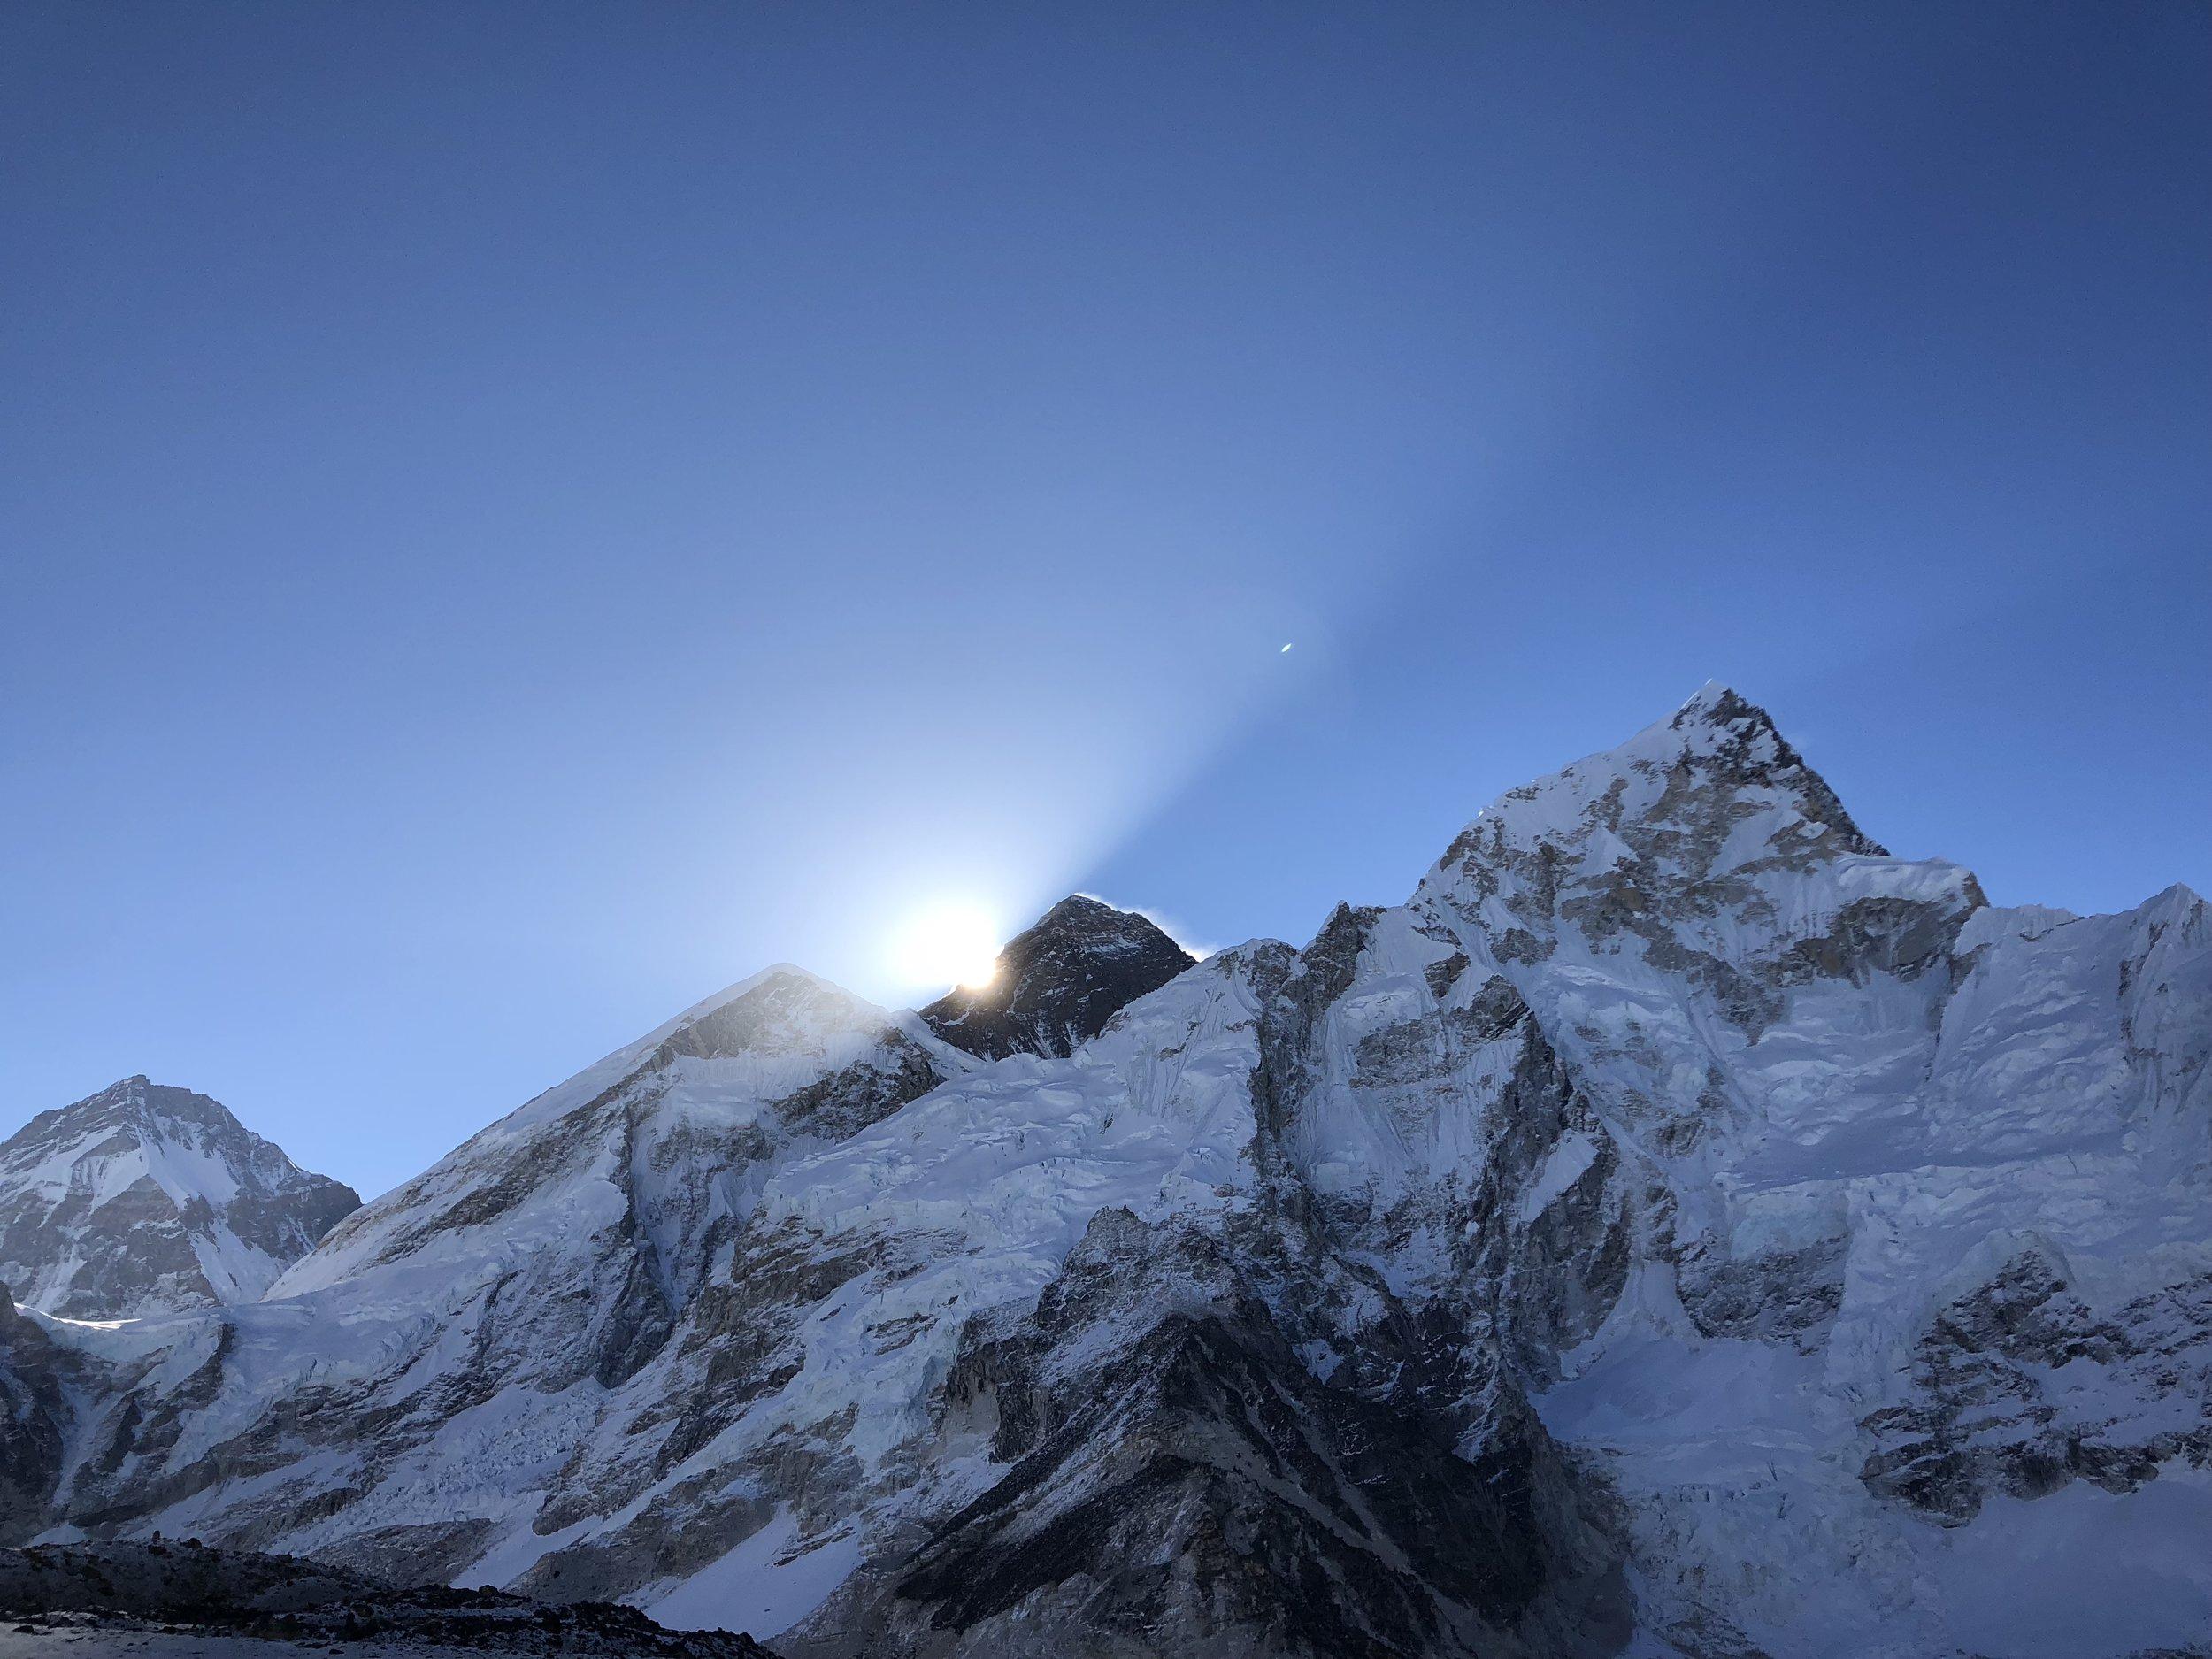 DAY 10:BEHOLD GODDESS MOTHER OF THE WORLD - GORAK SHEP to KALA PATHAR to PHERICHEElevation: 5,160 - 5,555 - 4,370 mDistance: 13 km